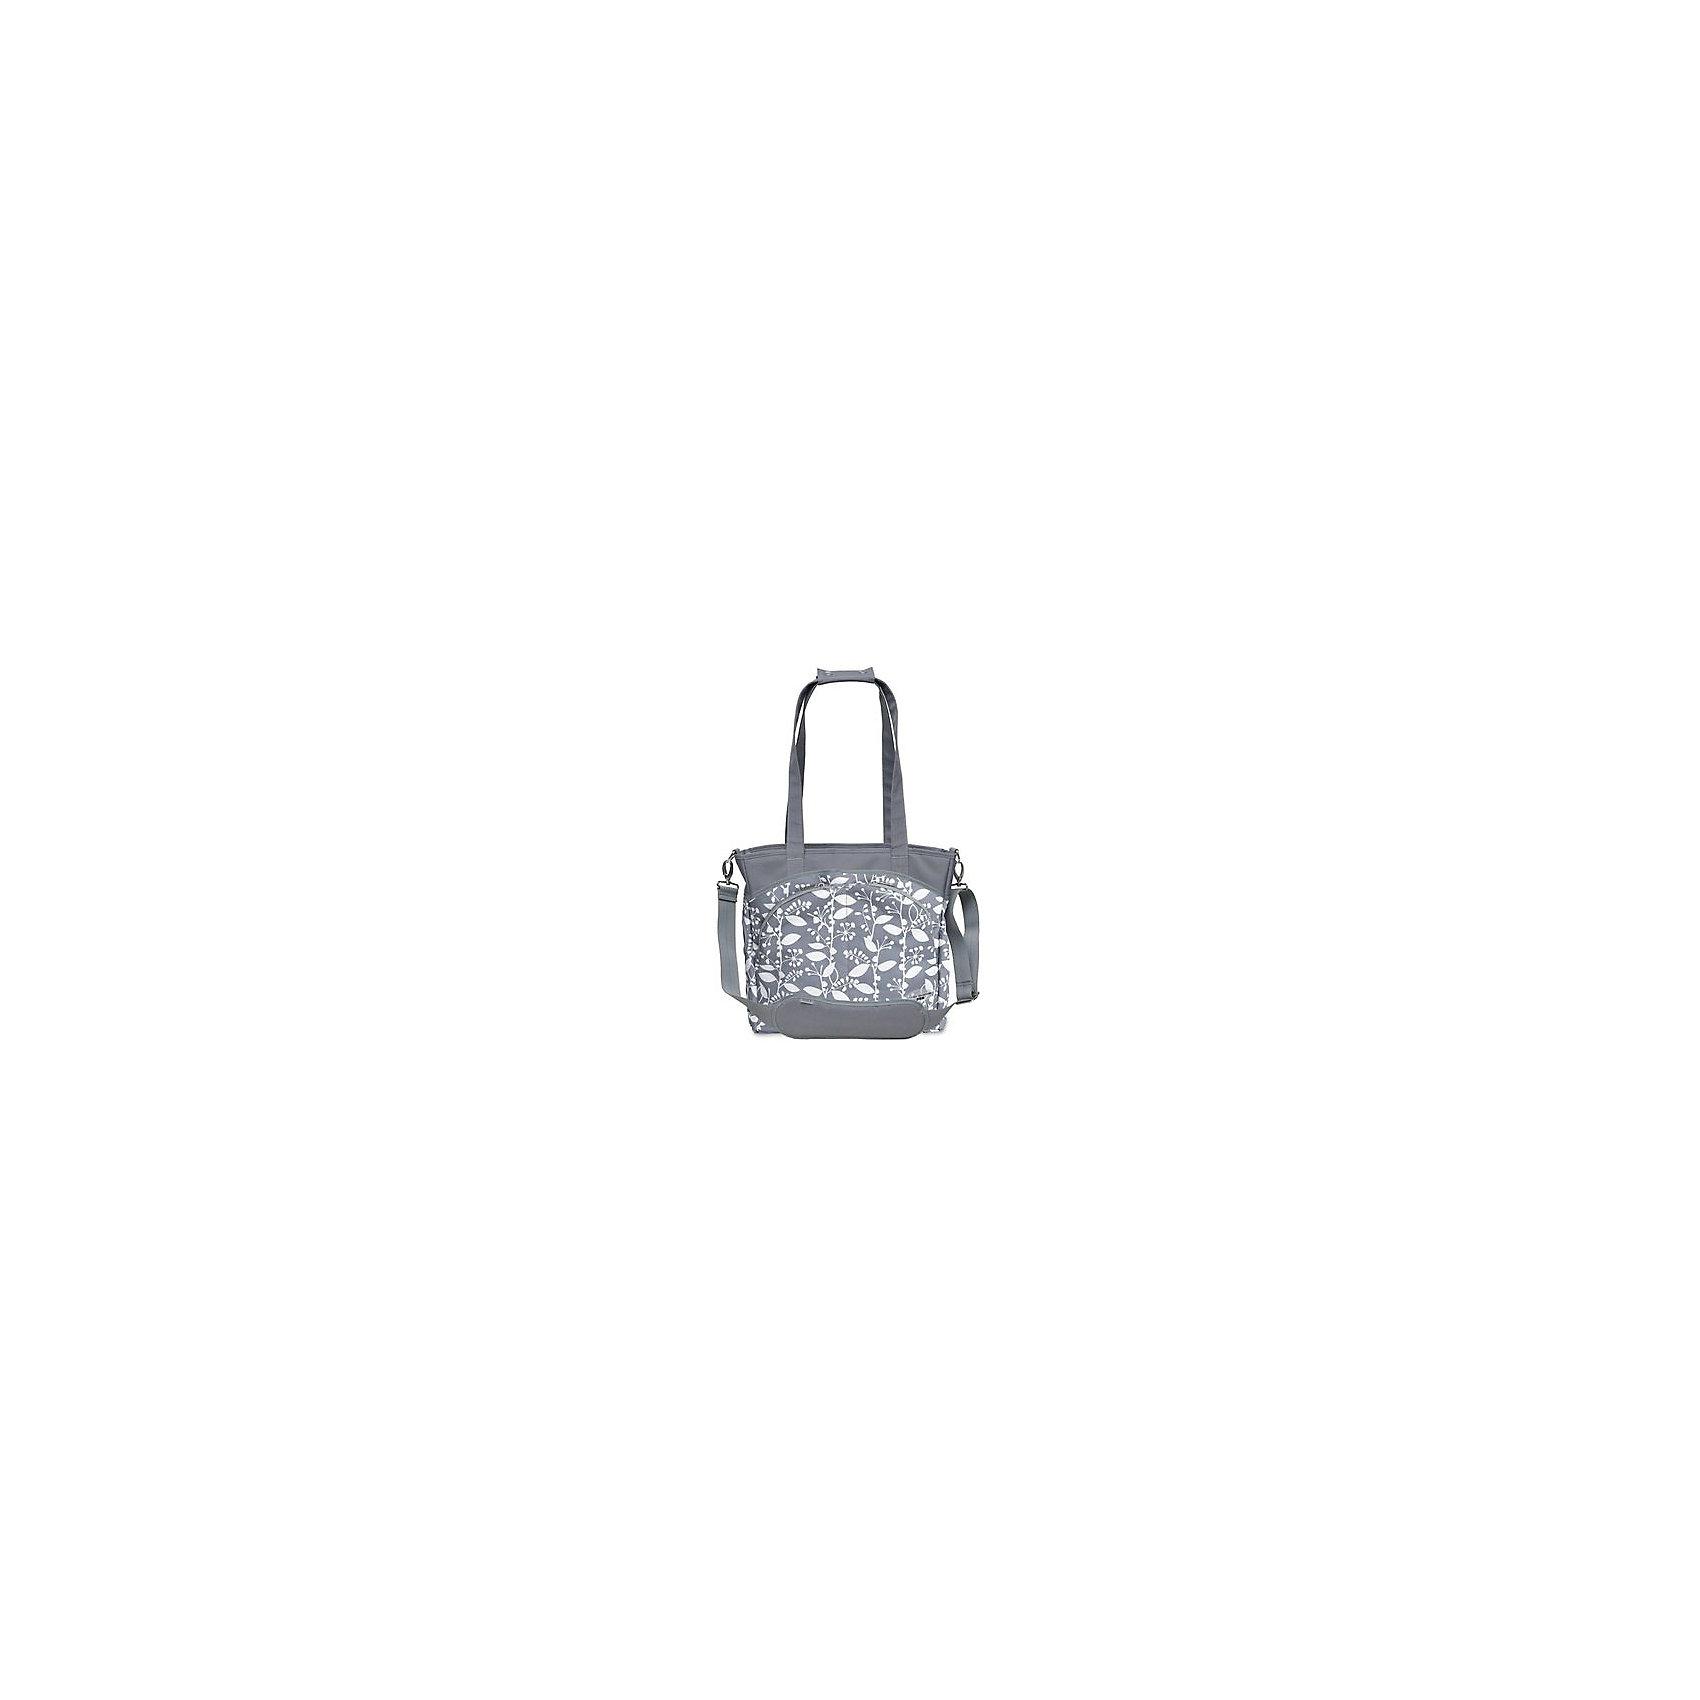 JJ COLE Сумка Mode,JJ Cole, серый с цветочным орнаментом